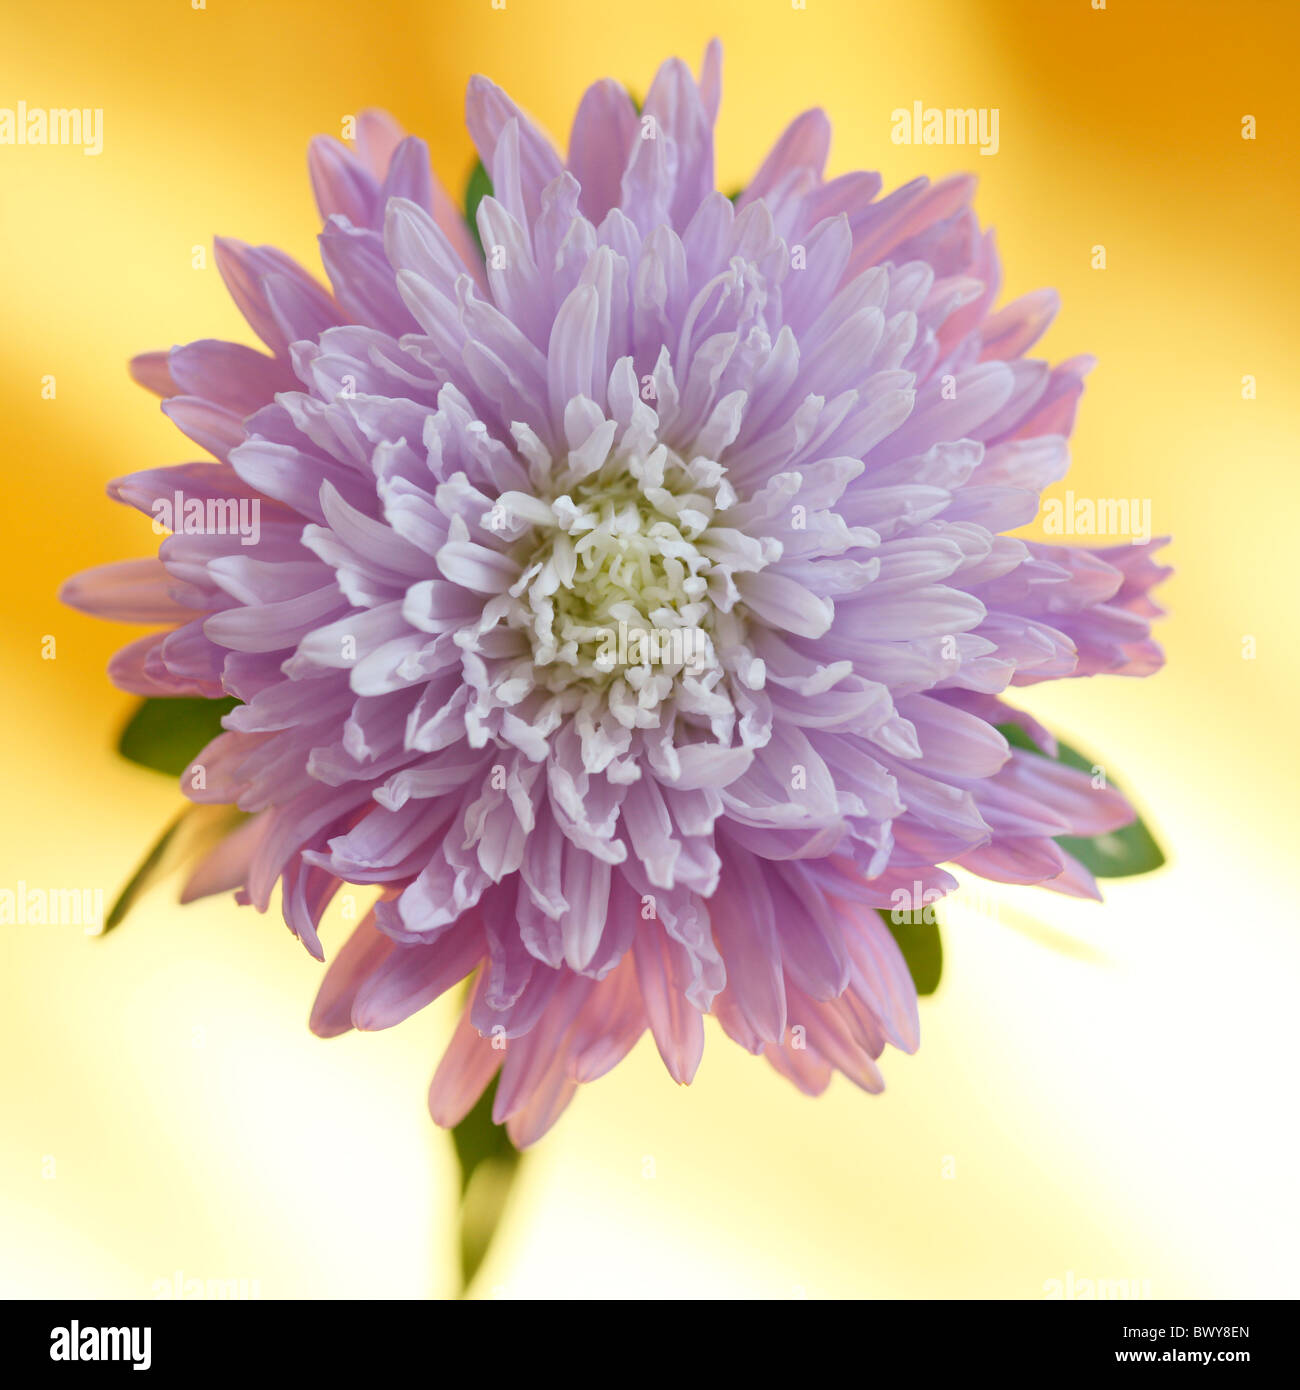 wonderful lilac aster in full bloom Jane-Ann Butler Photography JABP872 - Stock Image